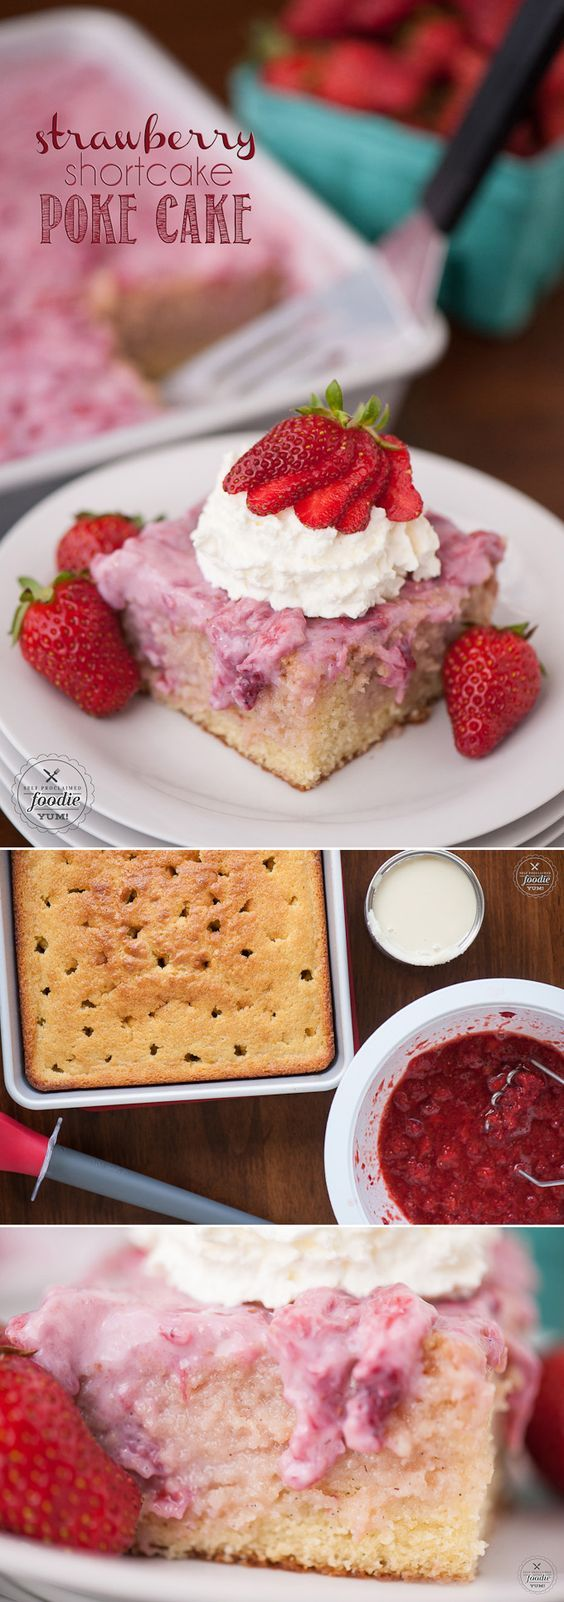 Strawberry Shortcake Poke Cake Self Proclaimed Foodie Fruit Tart Recipe Strawberry Recipes Tart Recipes